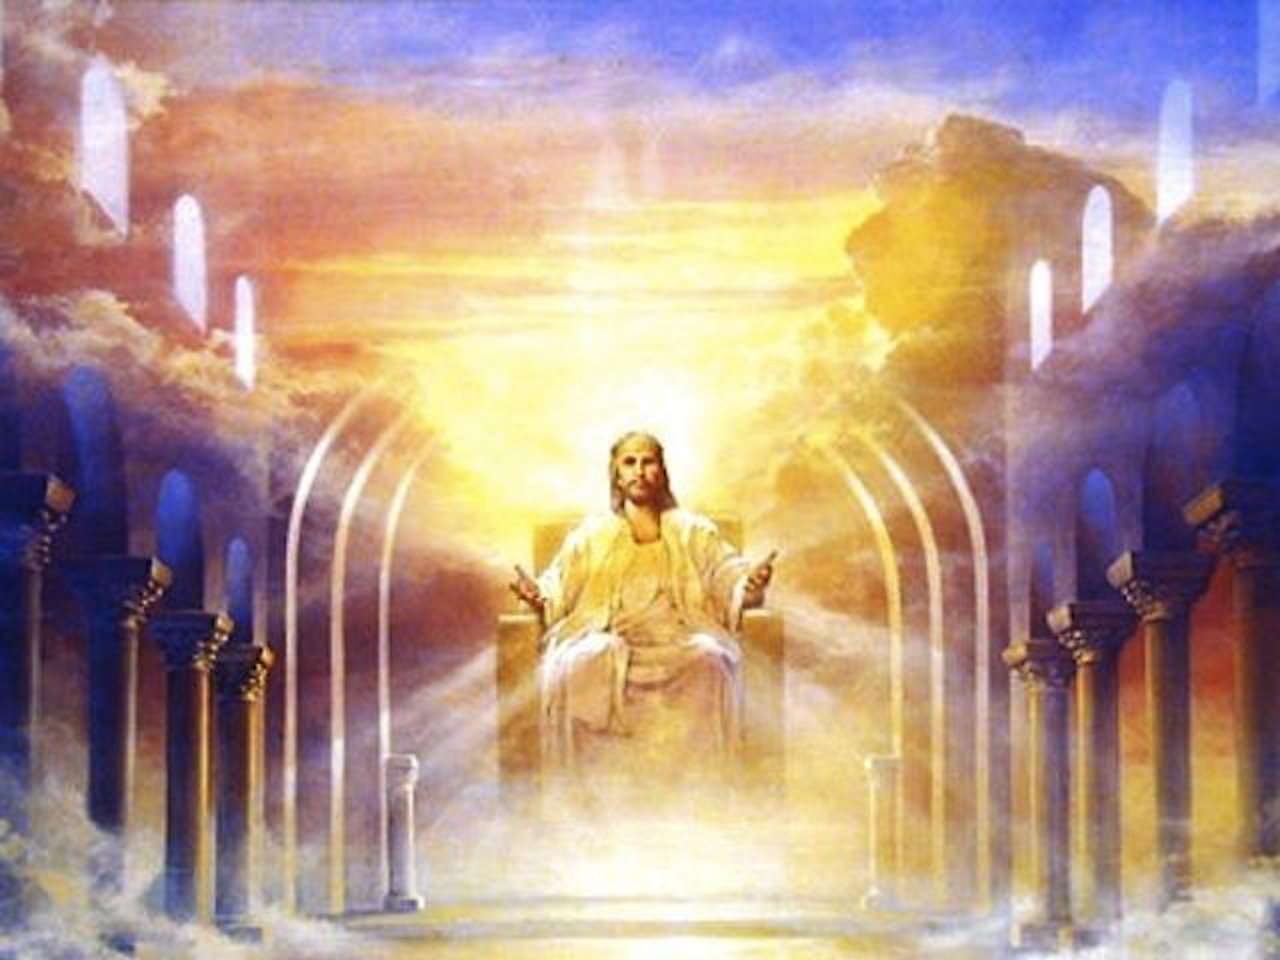 Явлення на небі фото 20 фотография